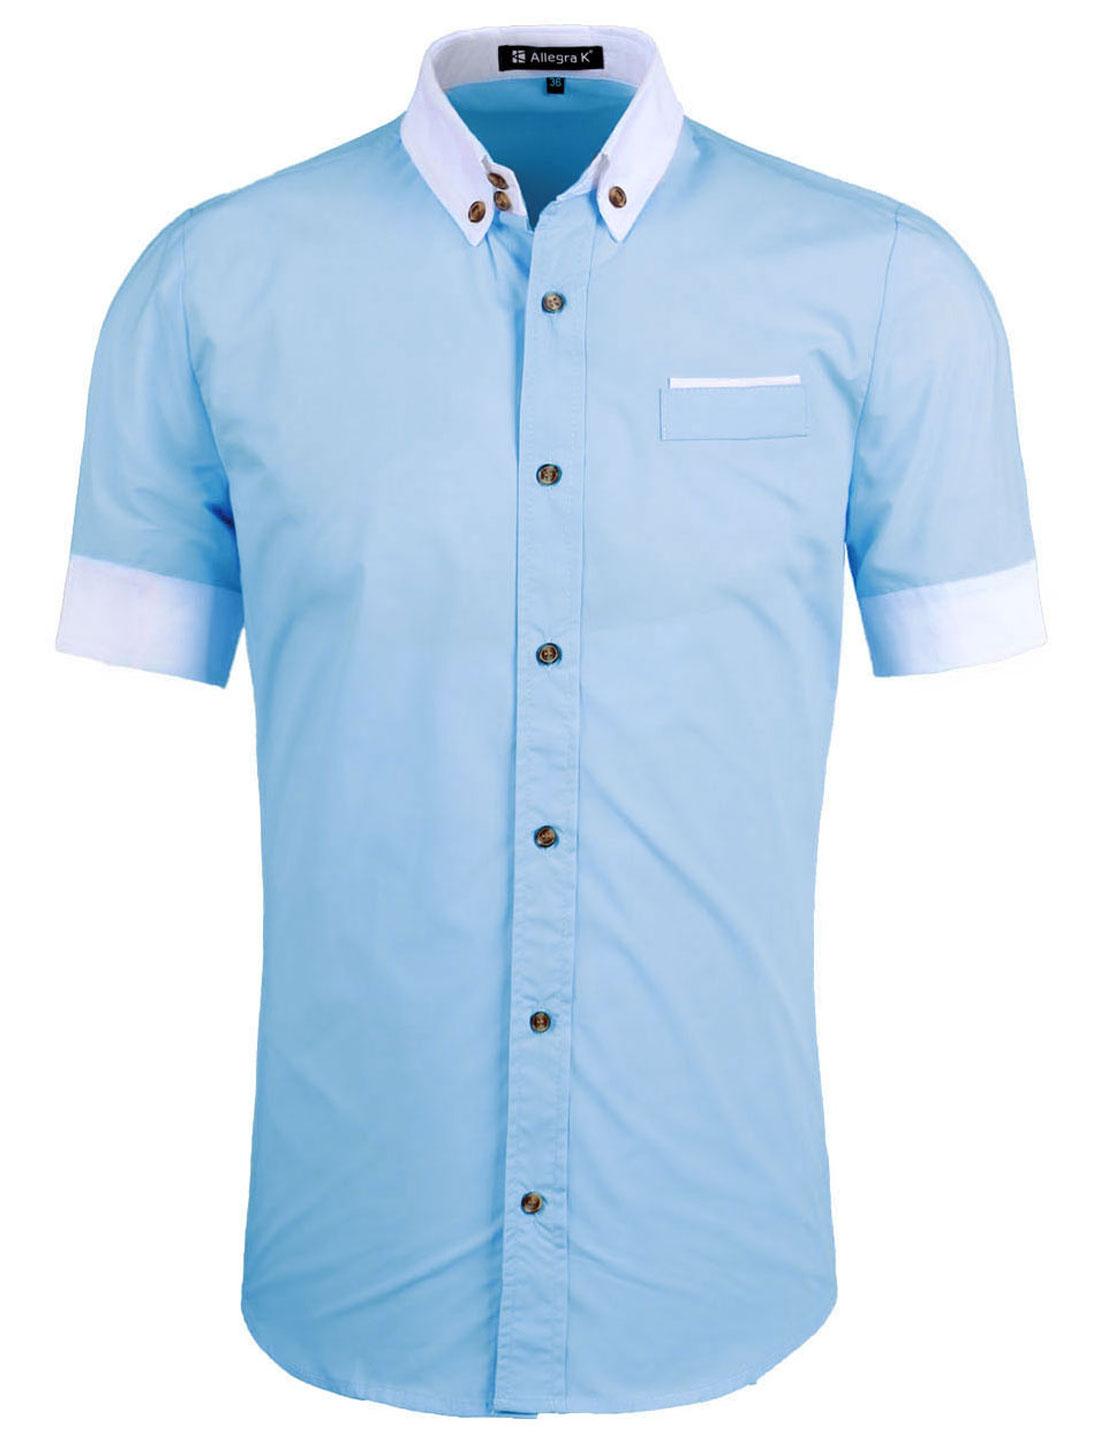 Men Point Collar Button Down Round Hem Casual Shirts Tops Light Blue M